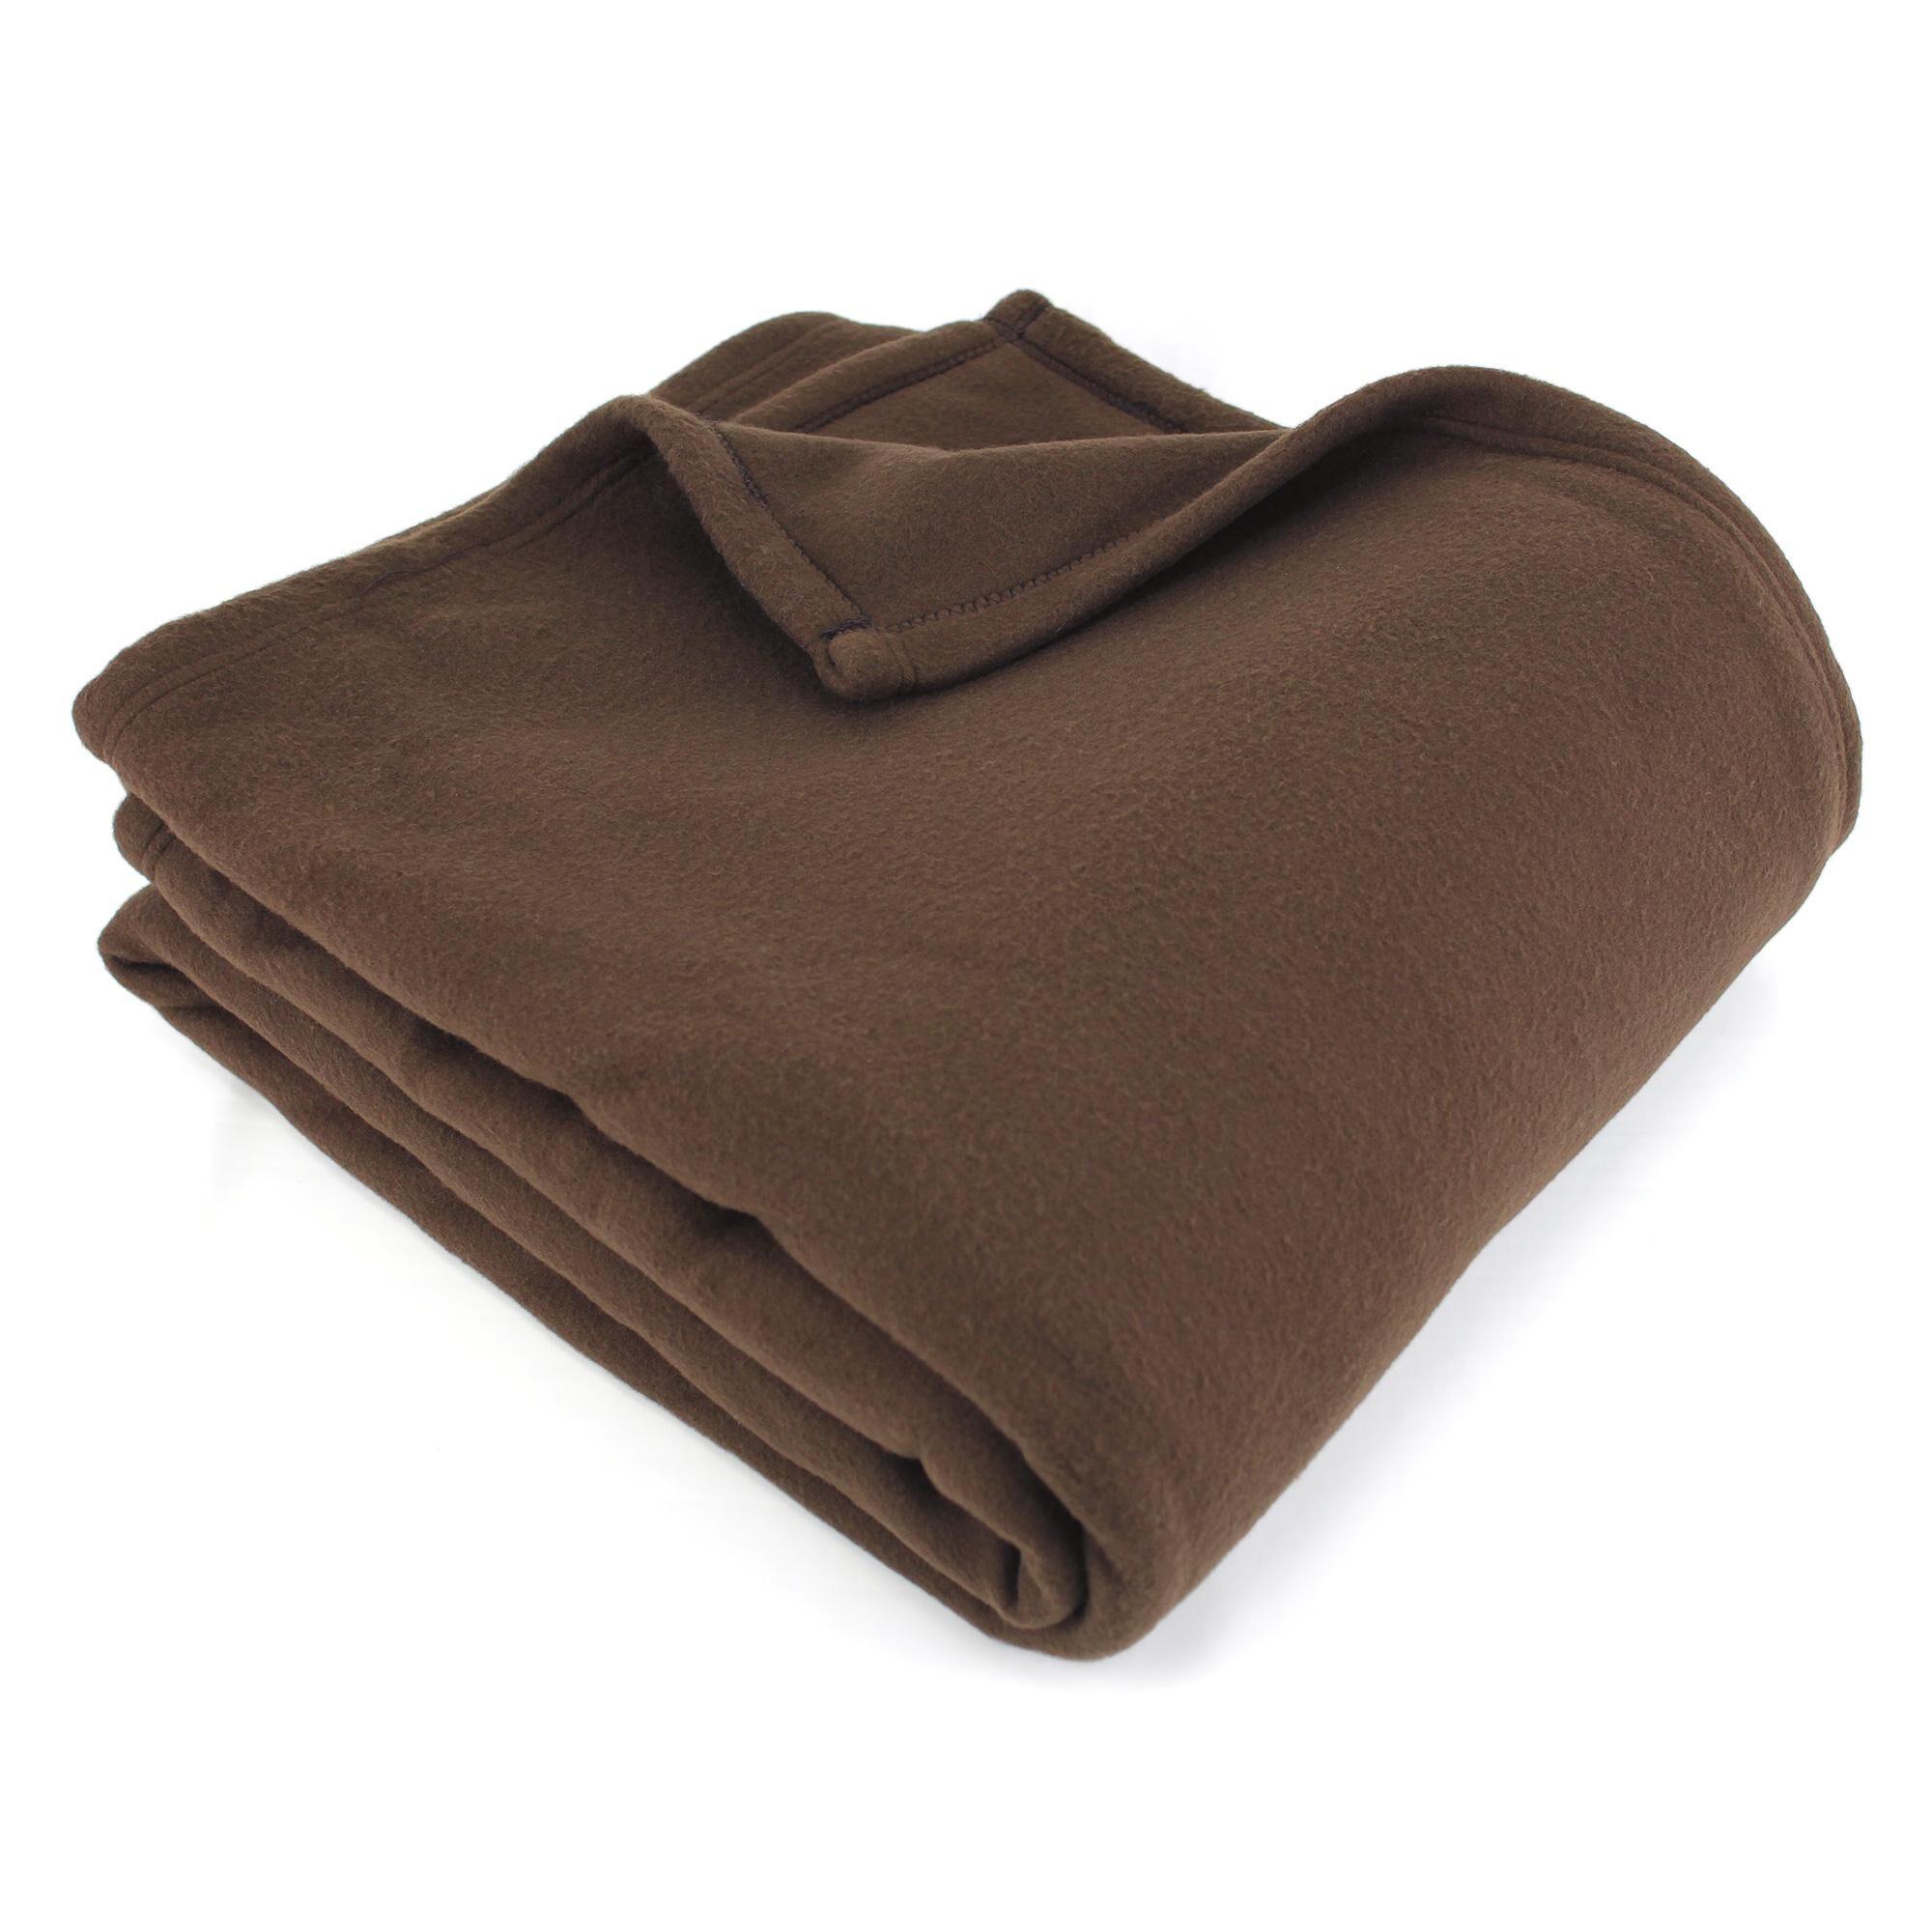 Linnea Couverture polaire 240x260 cm 100% Polyester 350 g/m2 TEDDY Marron Chocolat